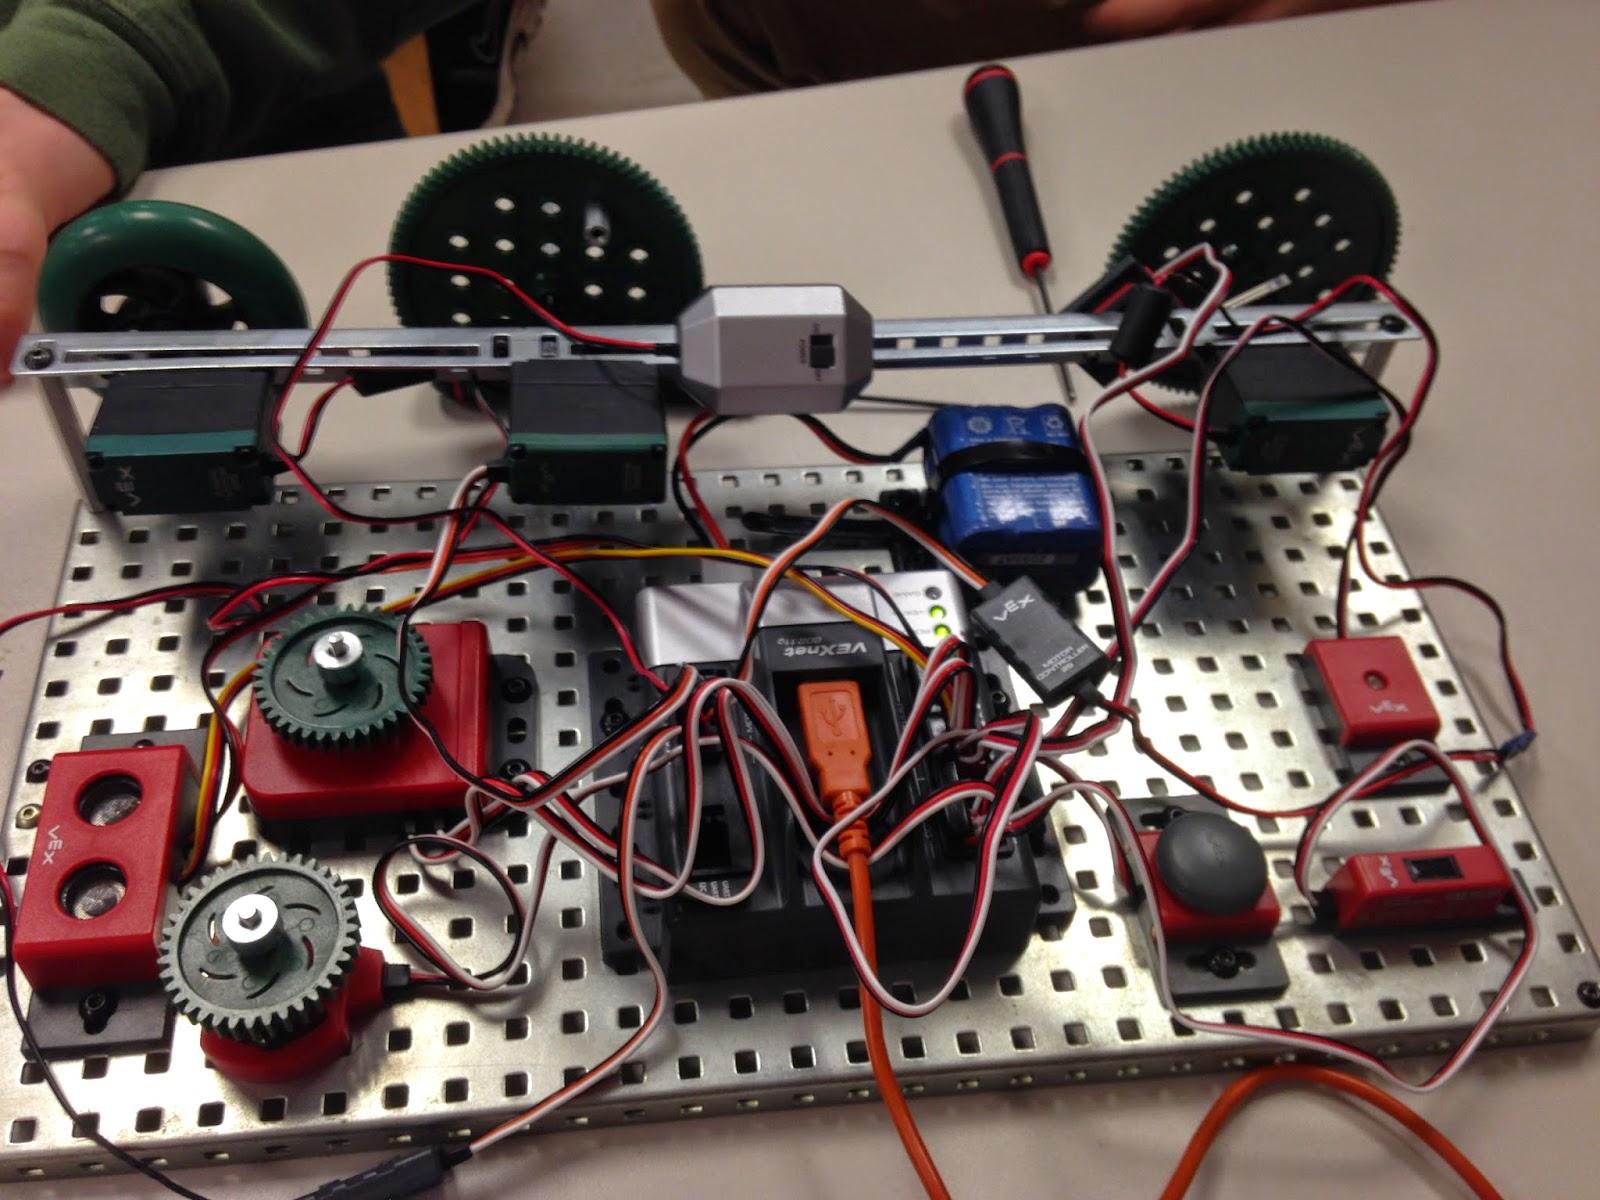 IMG_1092 principles of engineering at rmhs february 2015  at virtualis.co